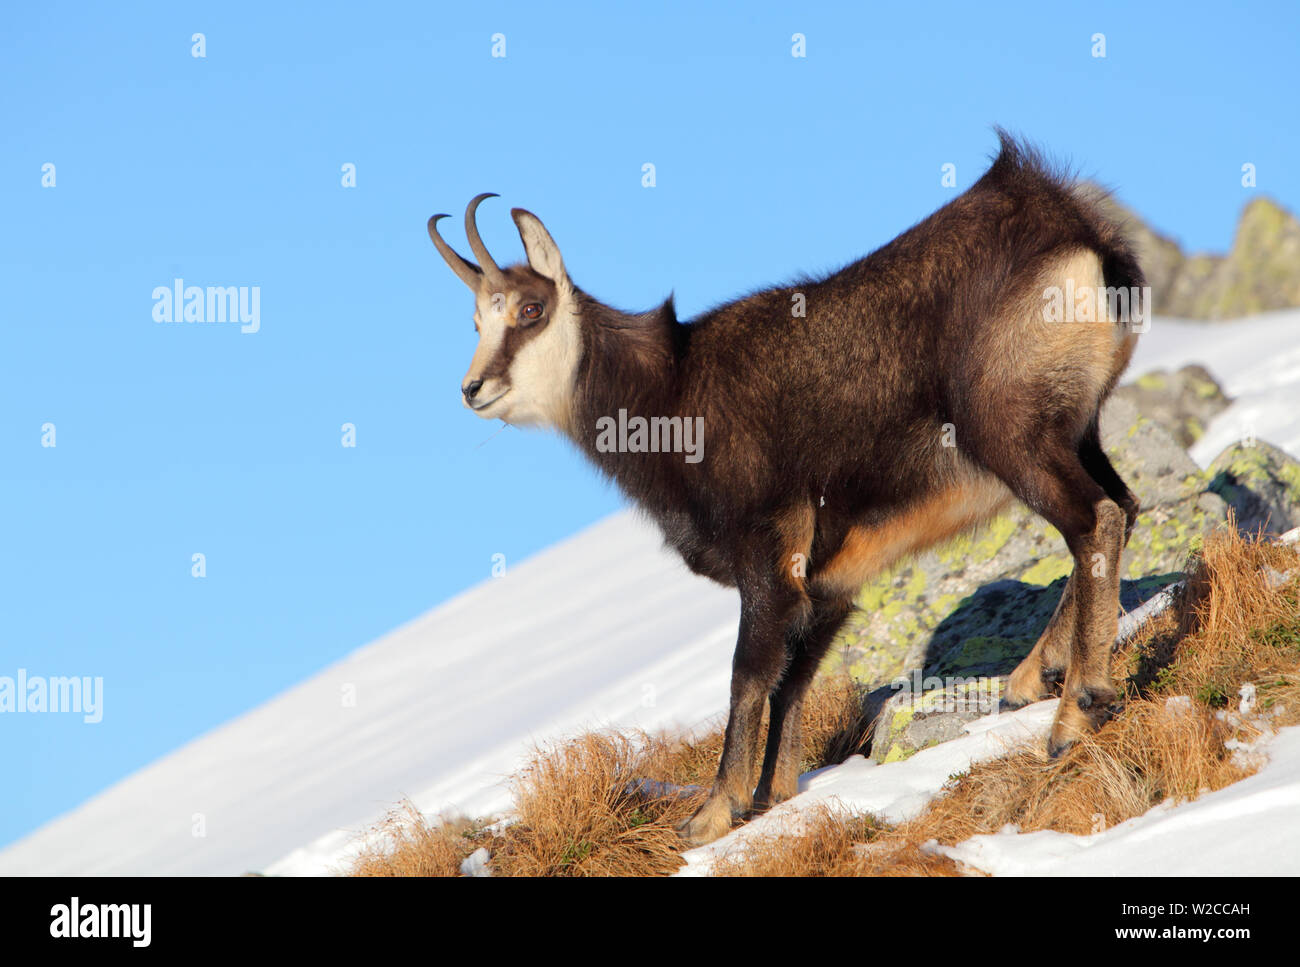 Chamois at winter in Tatras - rupicapra rupicapra Stock Photo